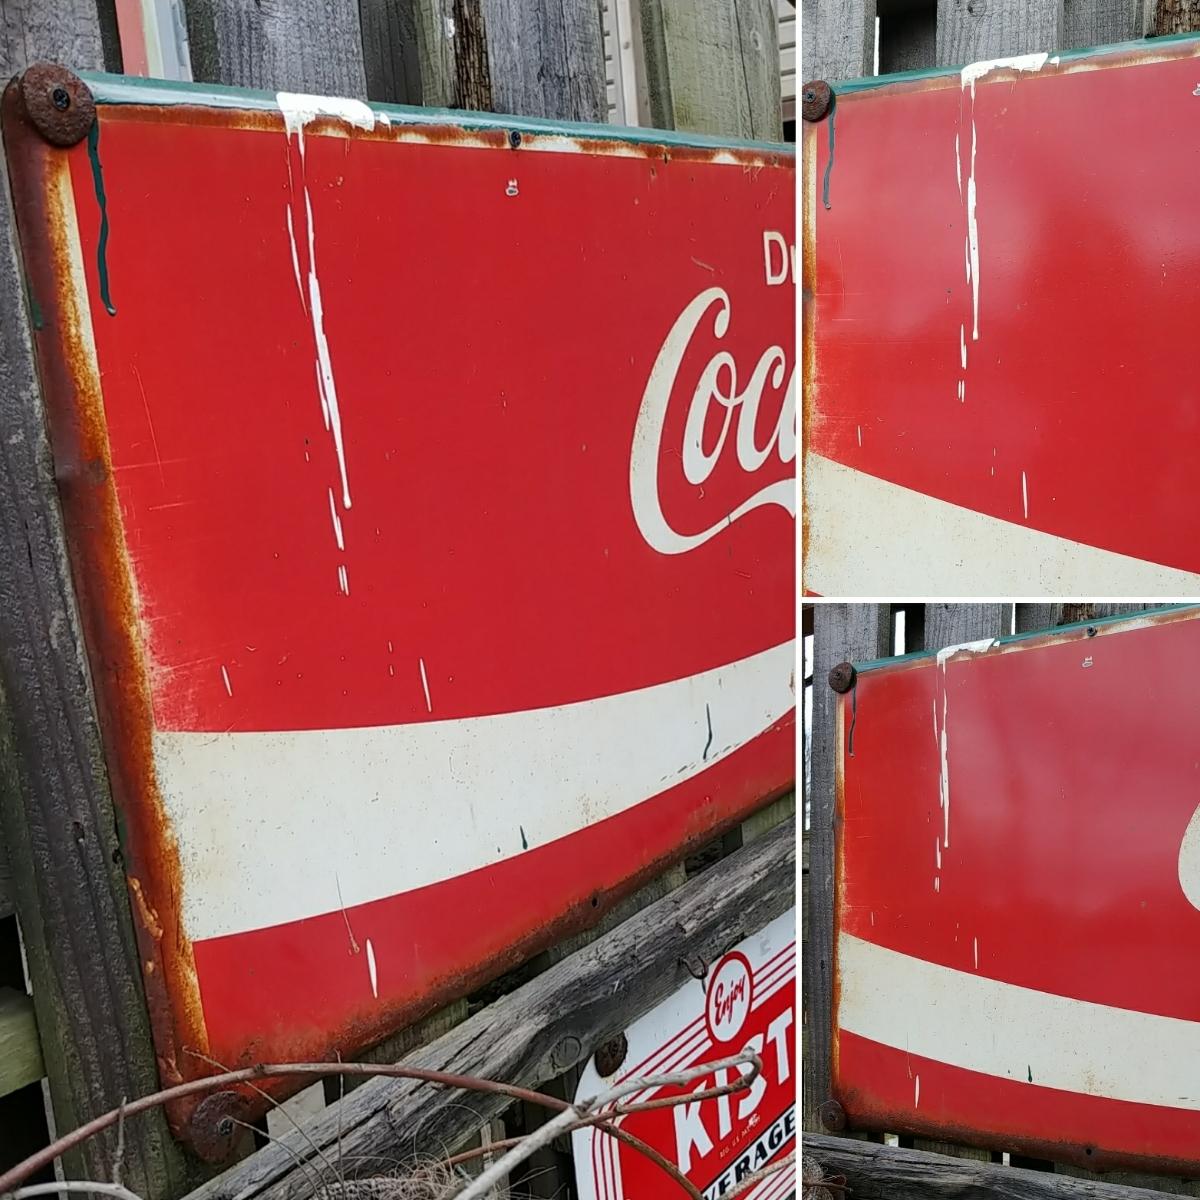 ☆AMERICAN VINTAGE SING☆Coca-Cola (コカ・コーラ)大型 フロント看板(非売品)#店舗什器#世田谷ベース #ガレージライフ_画像7